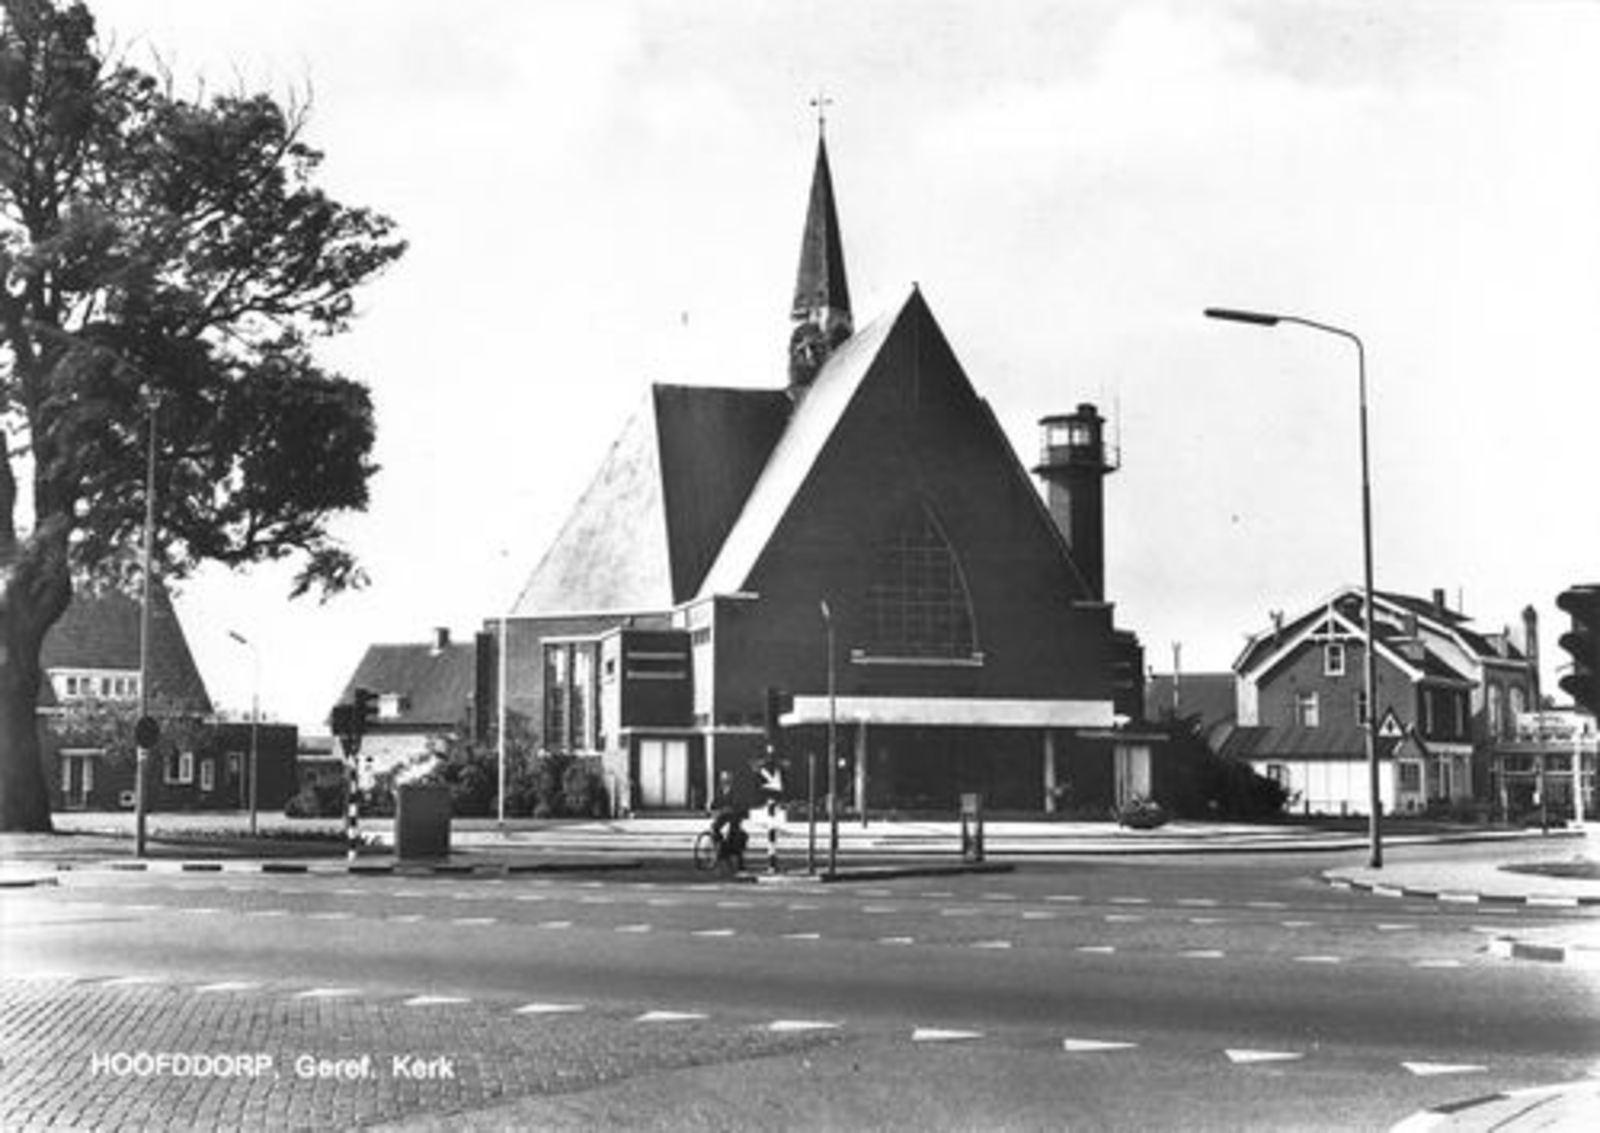 Marktplein Z 0094 1967 Geref kerk